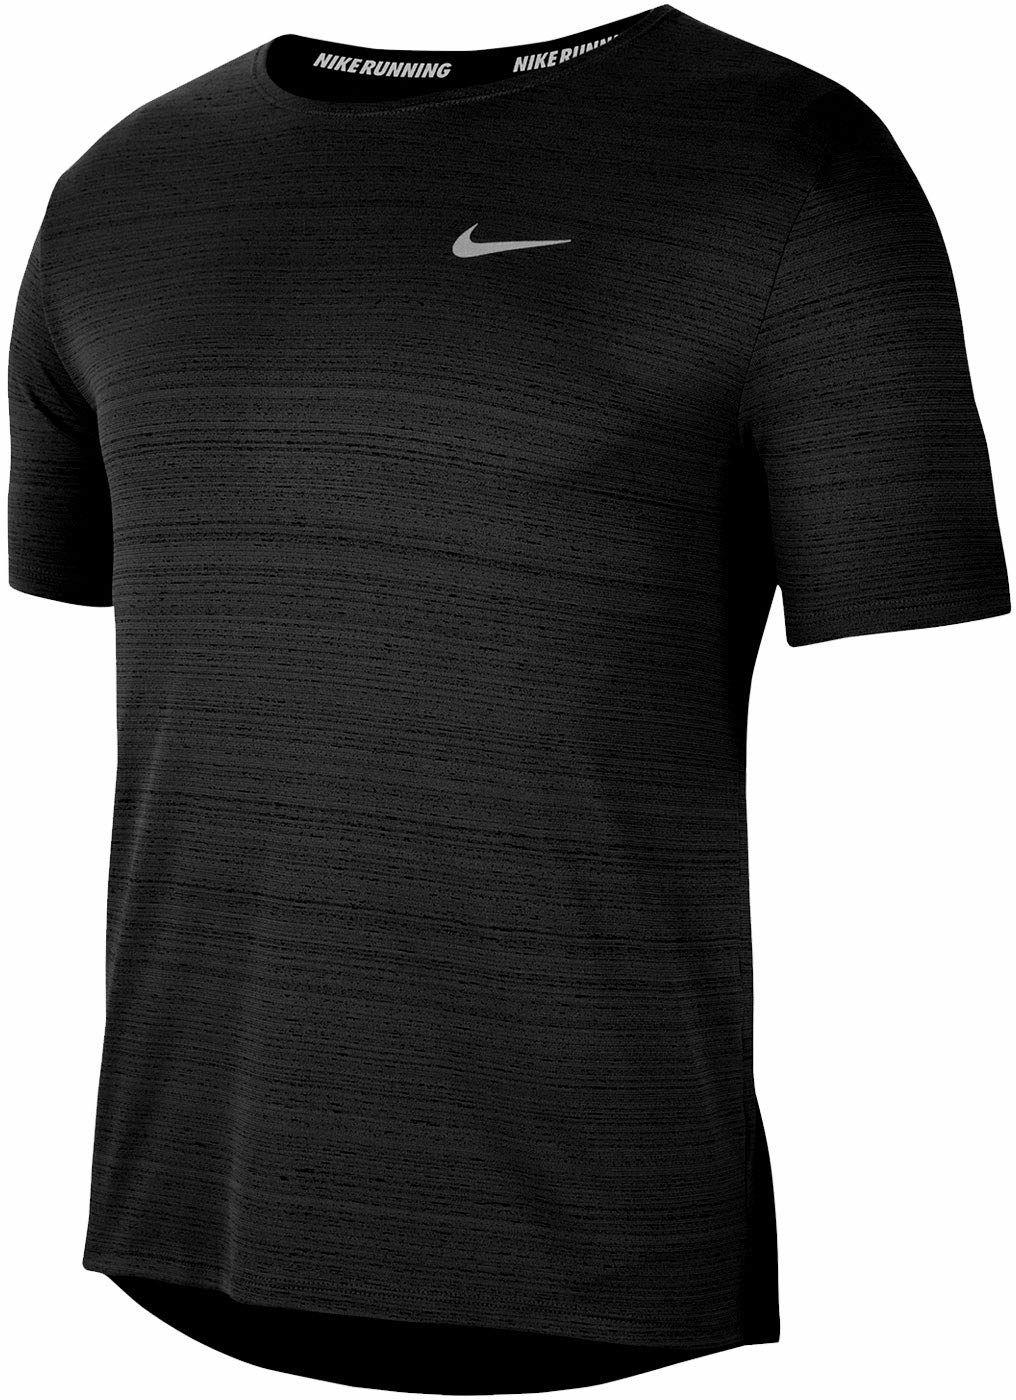 Nike Koszulka męska M Nk Df Miler Top Ss Black/(Reflective Silv) S